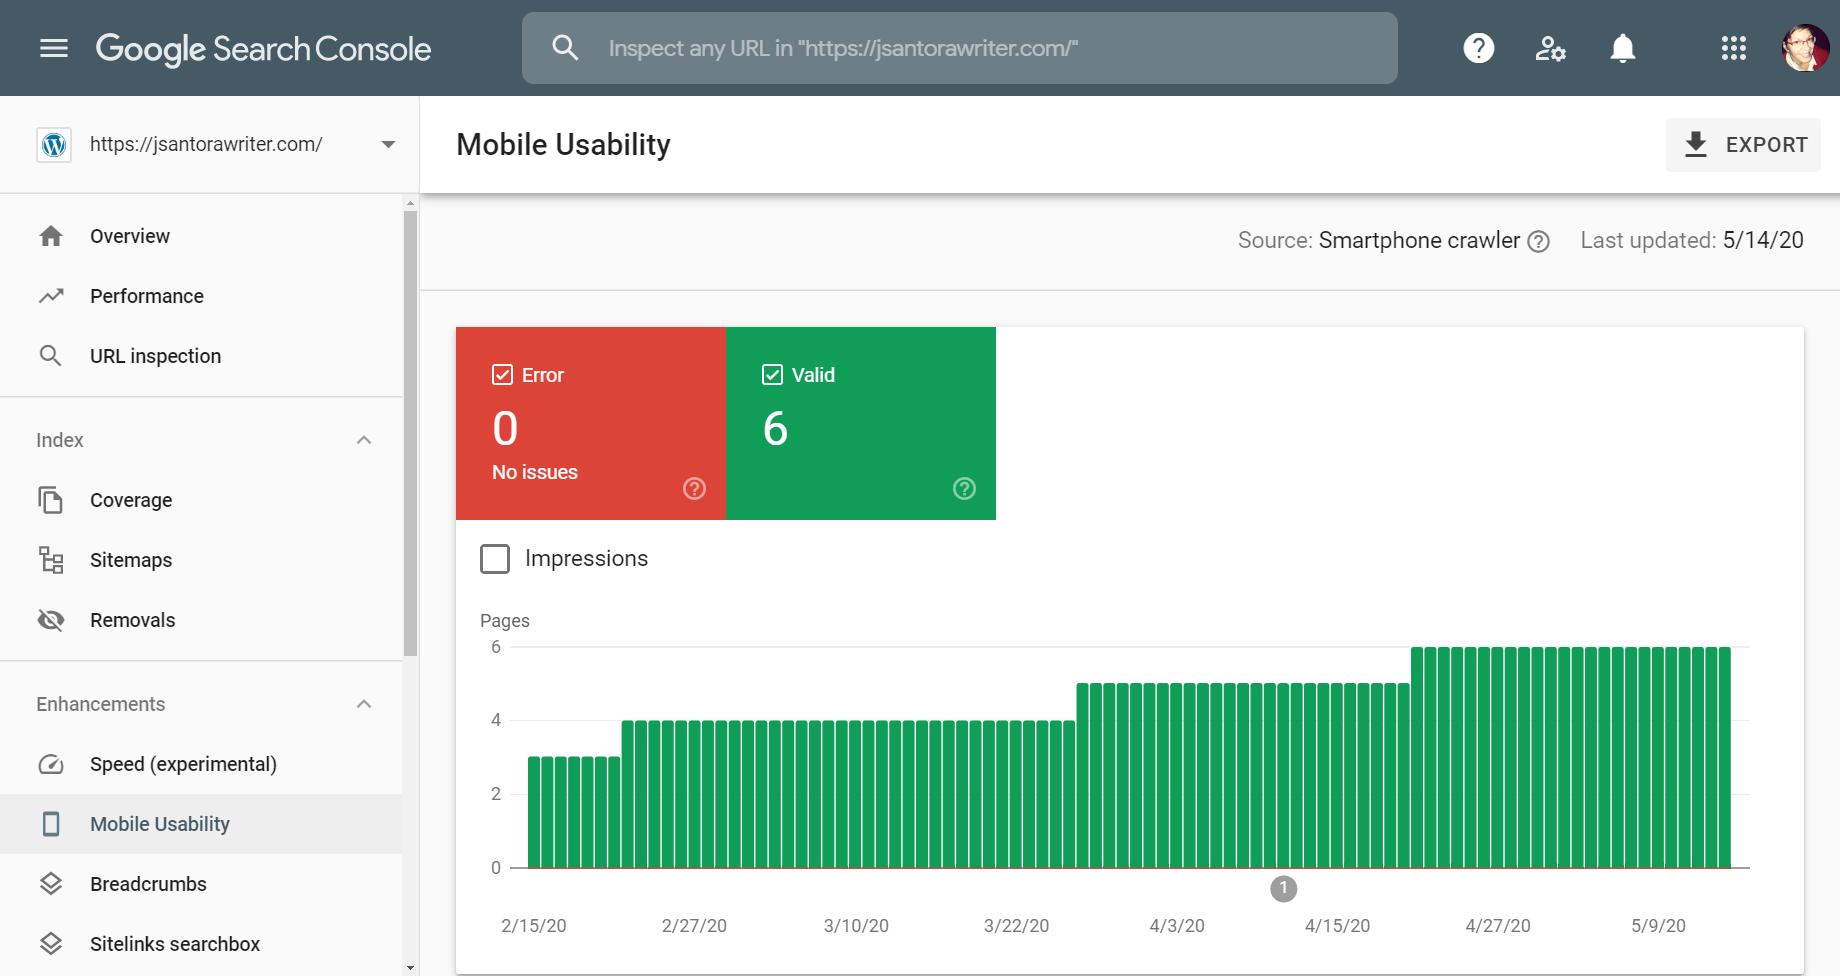 google search console mobile usability